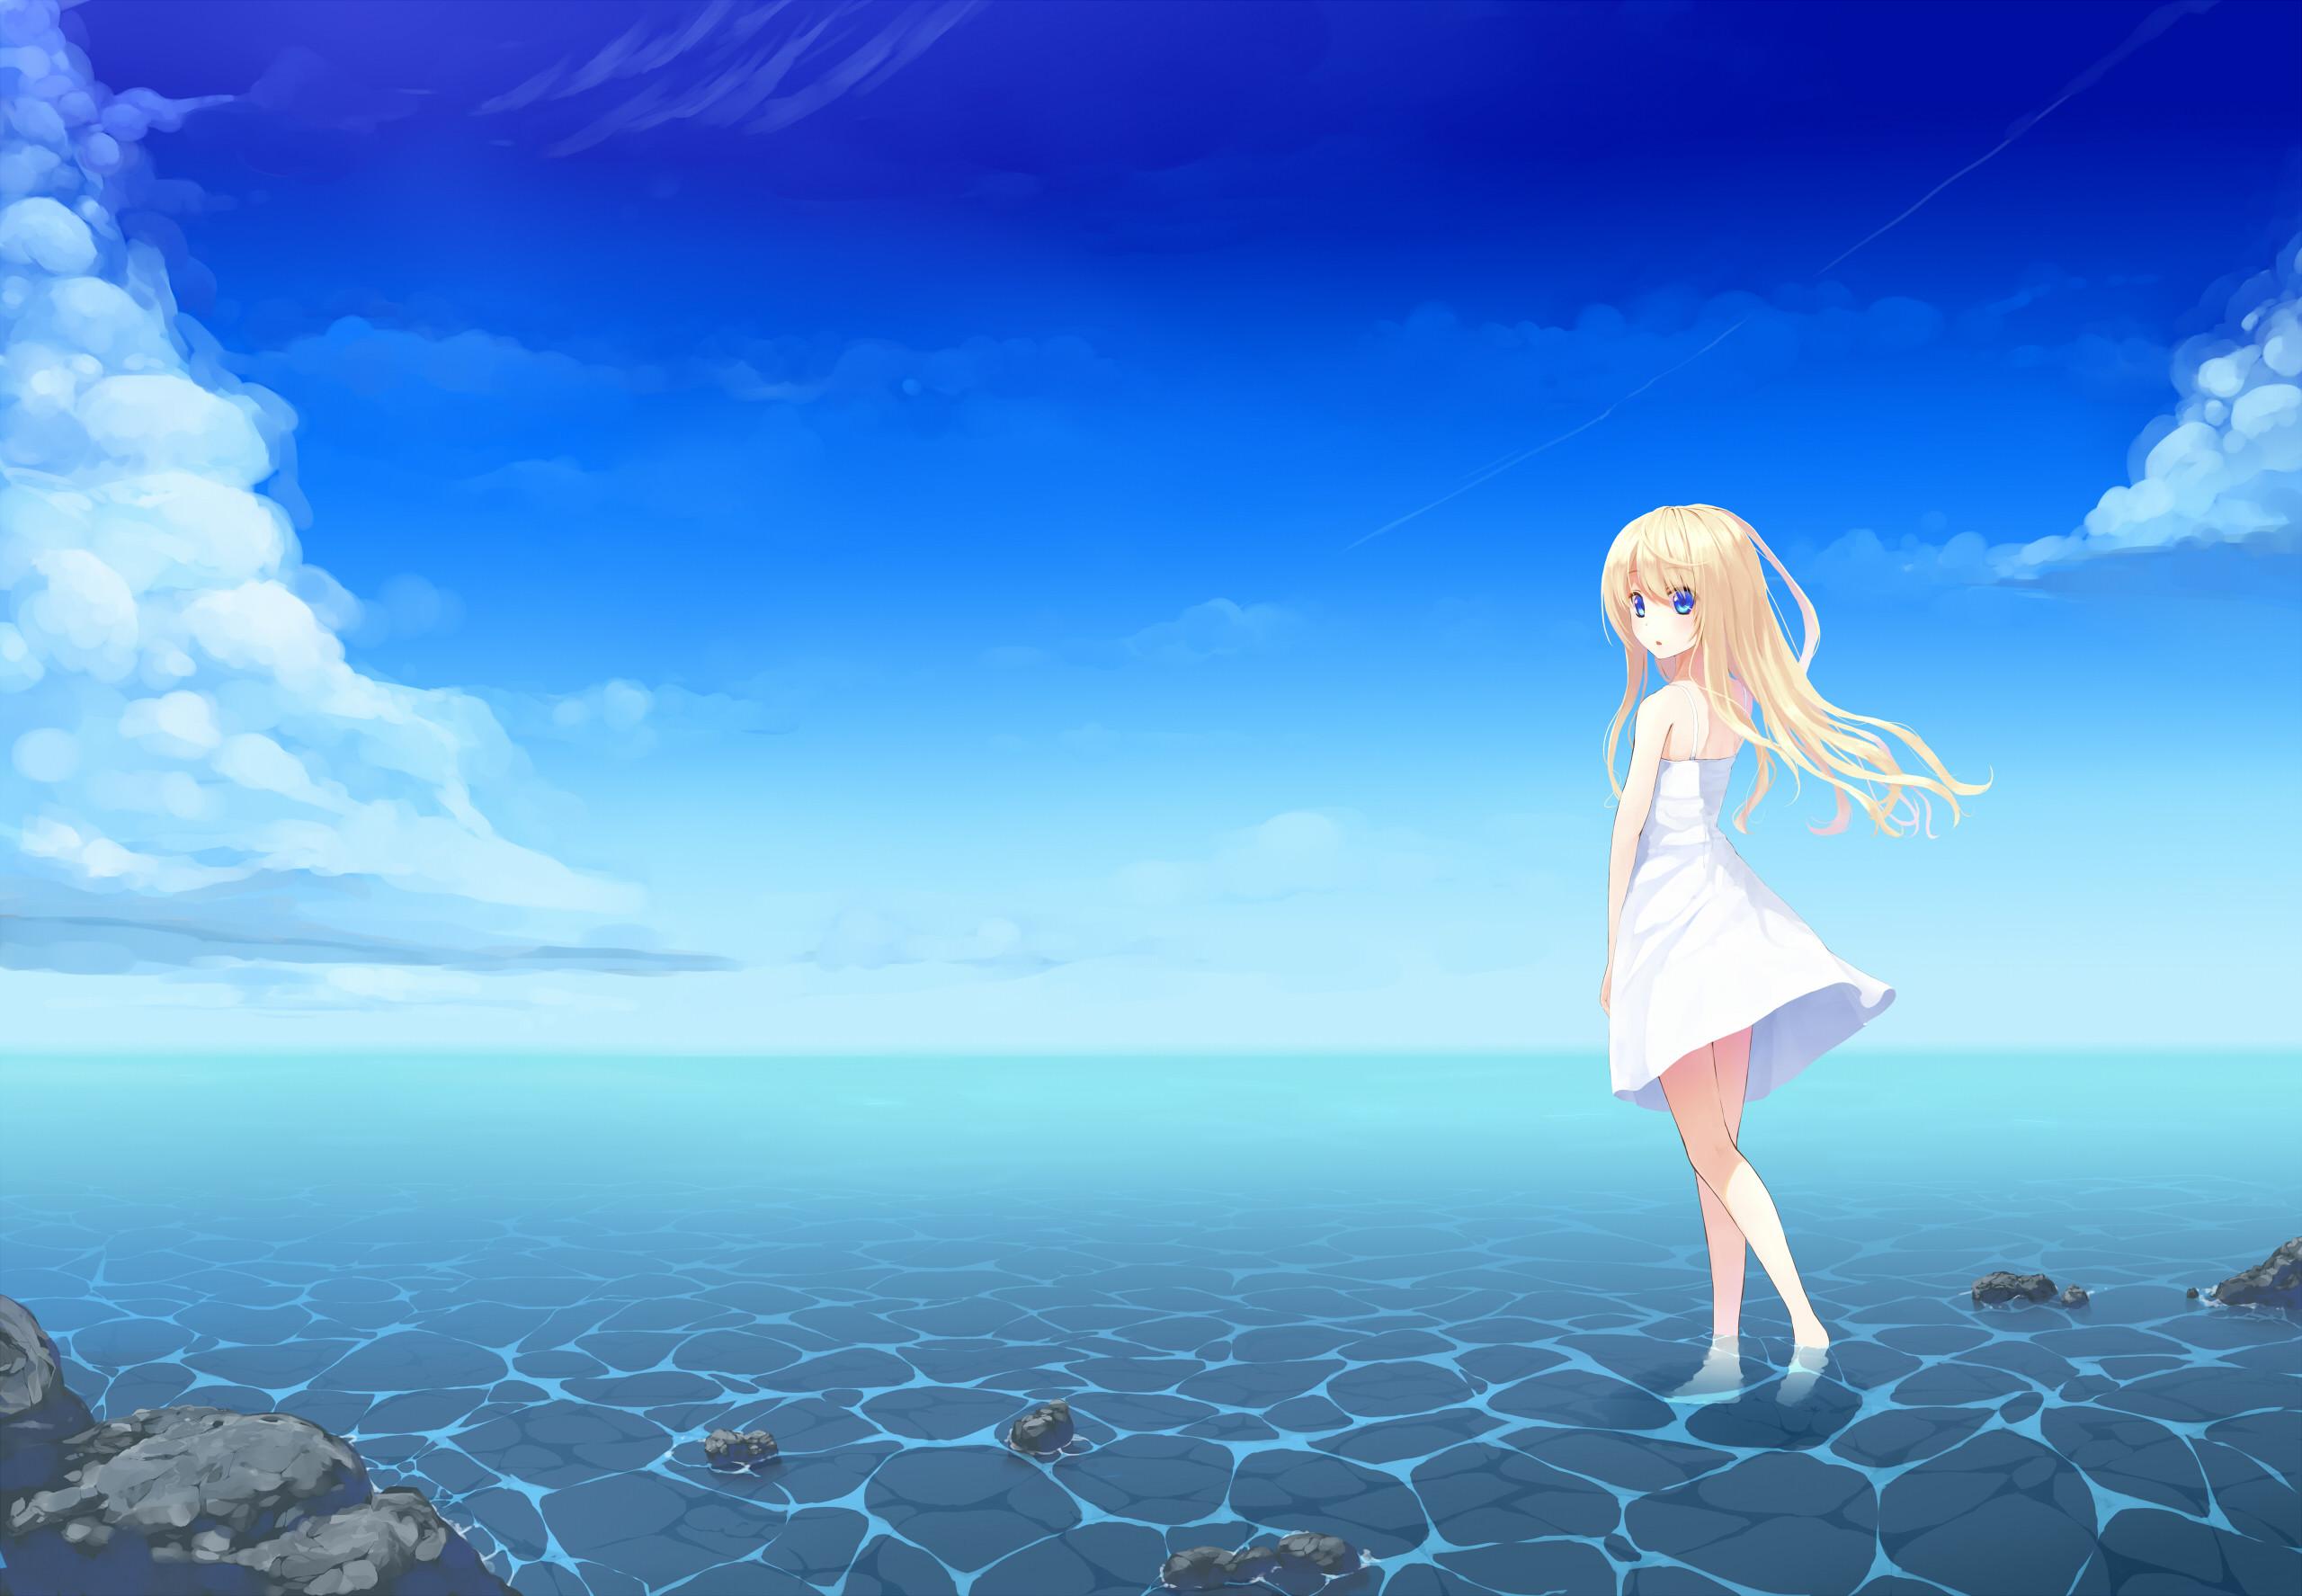 Blonde hair blue eyes clouds dress original sky uttt water .